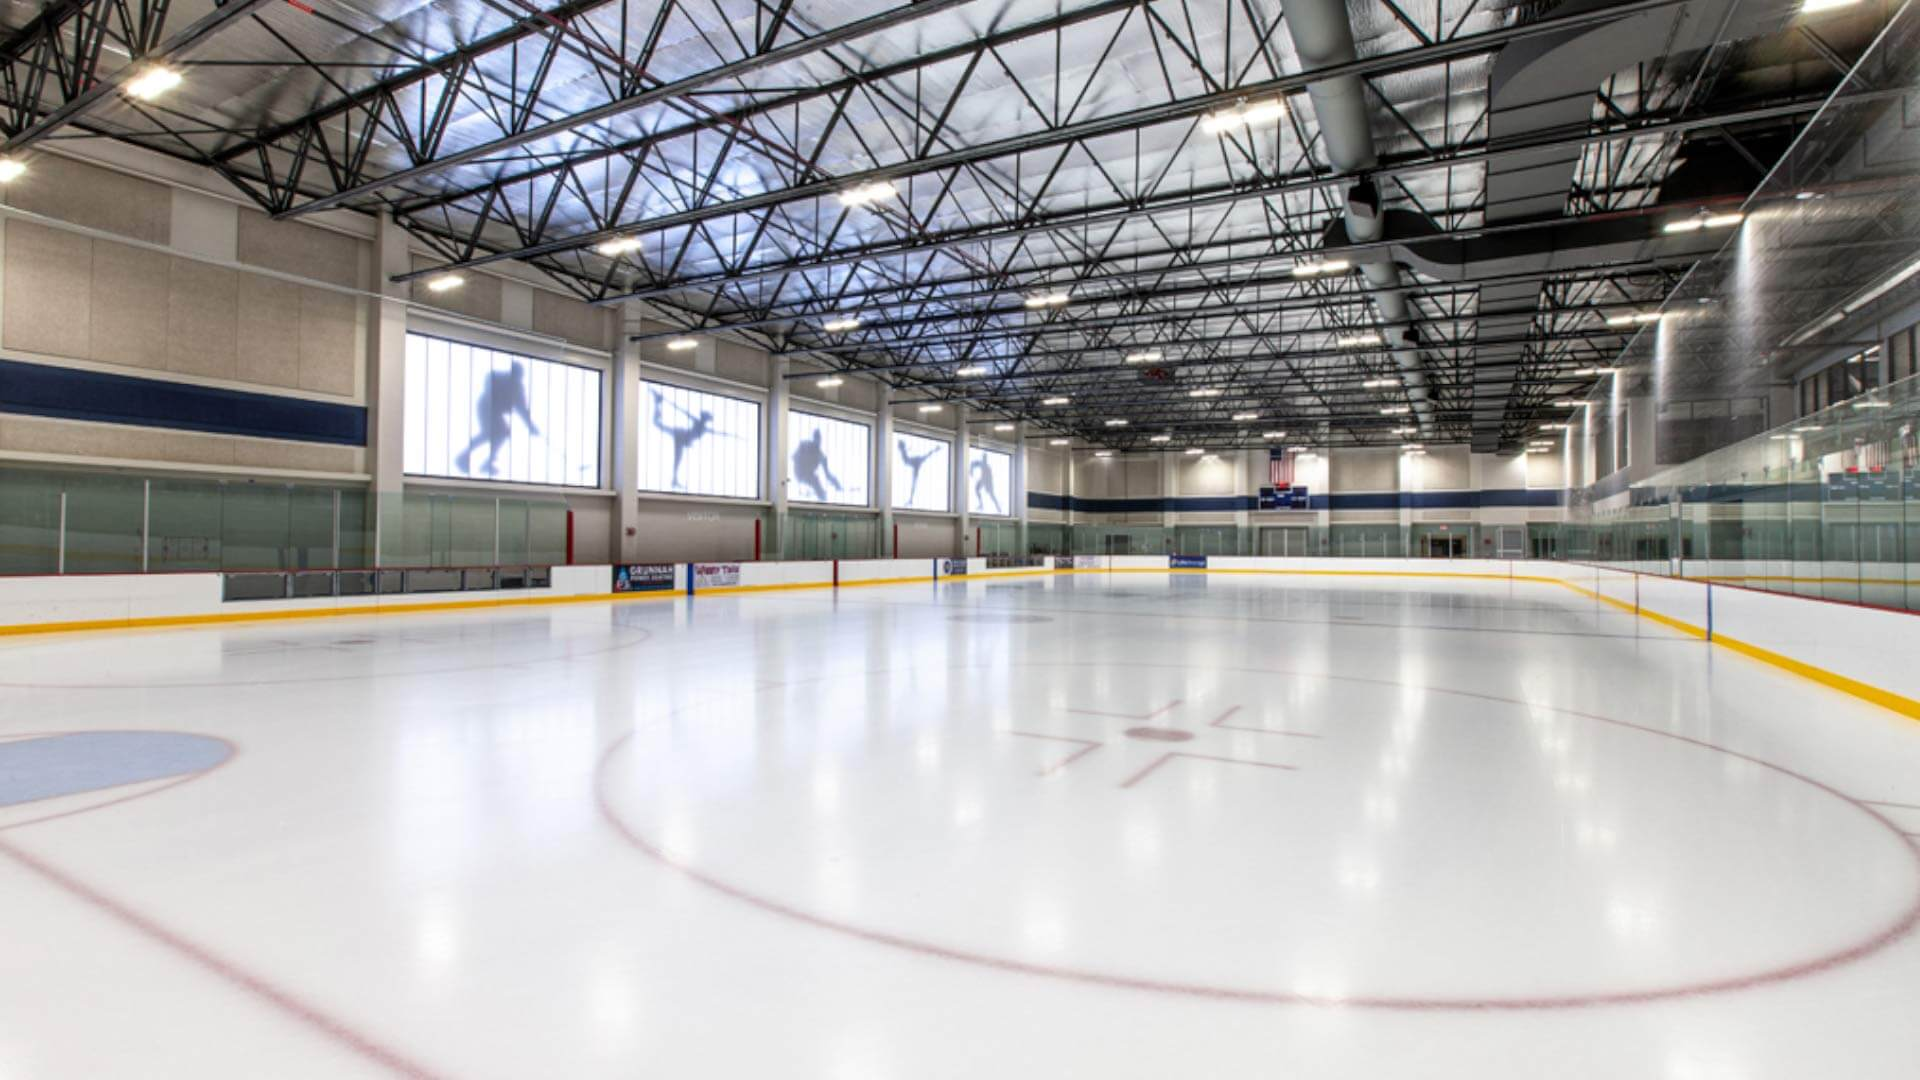 Glenview Community Ice Center